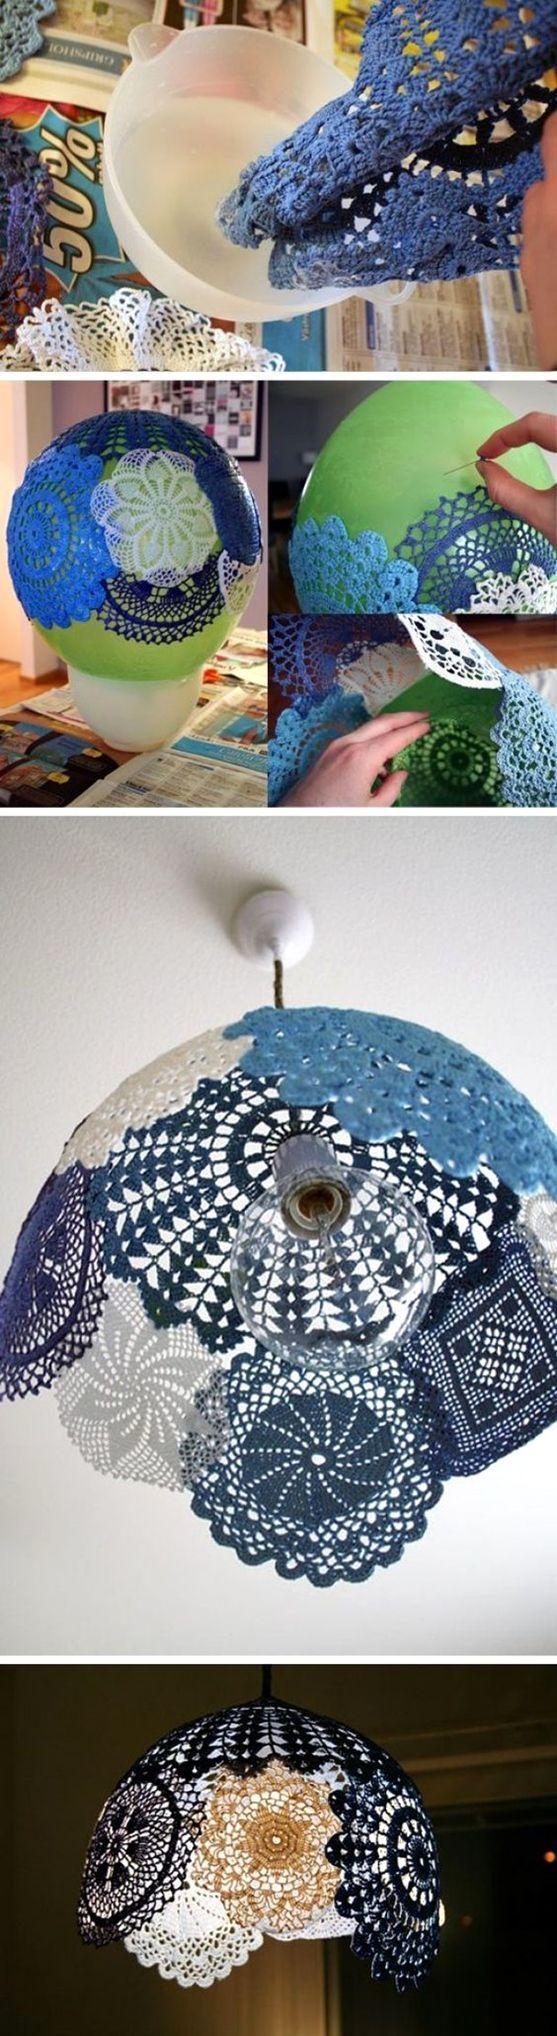 25  DIY ideas for cheap and home decor